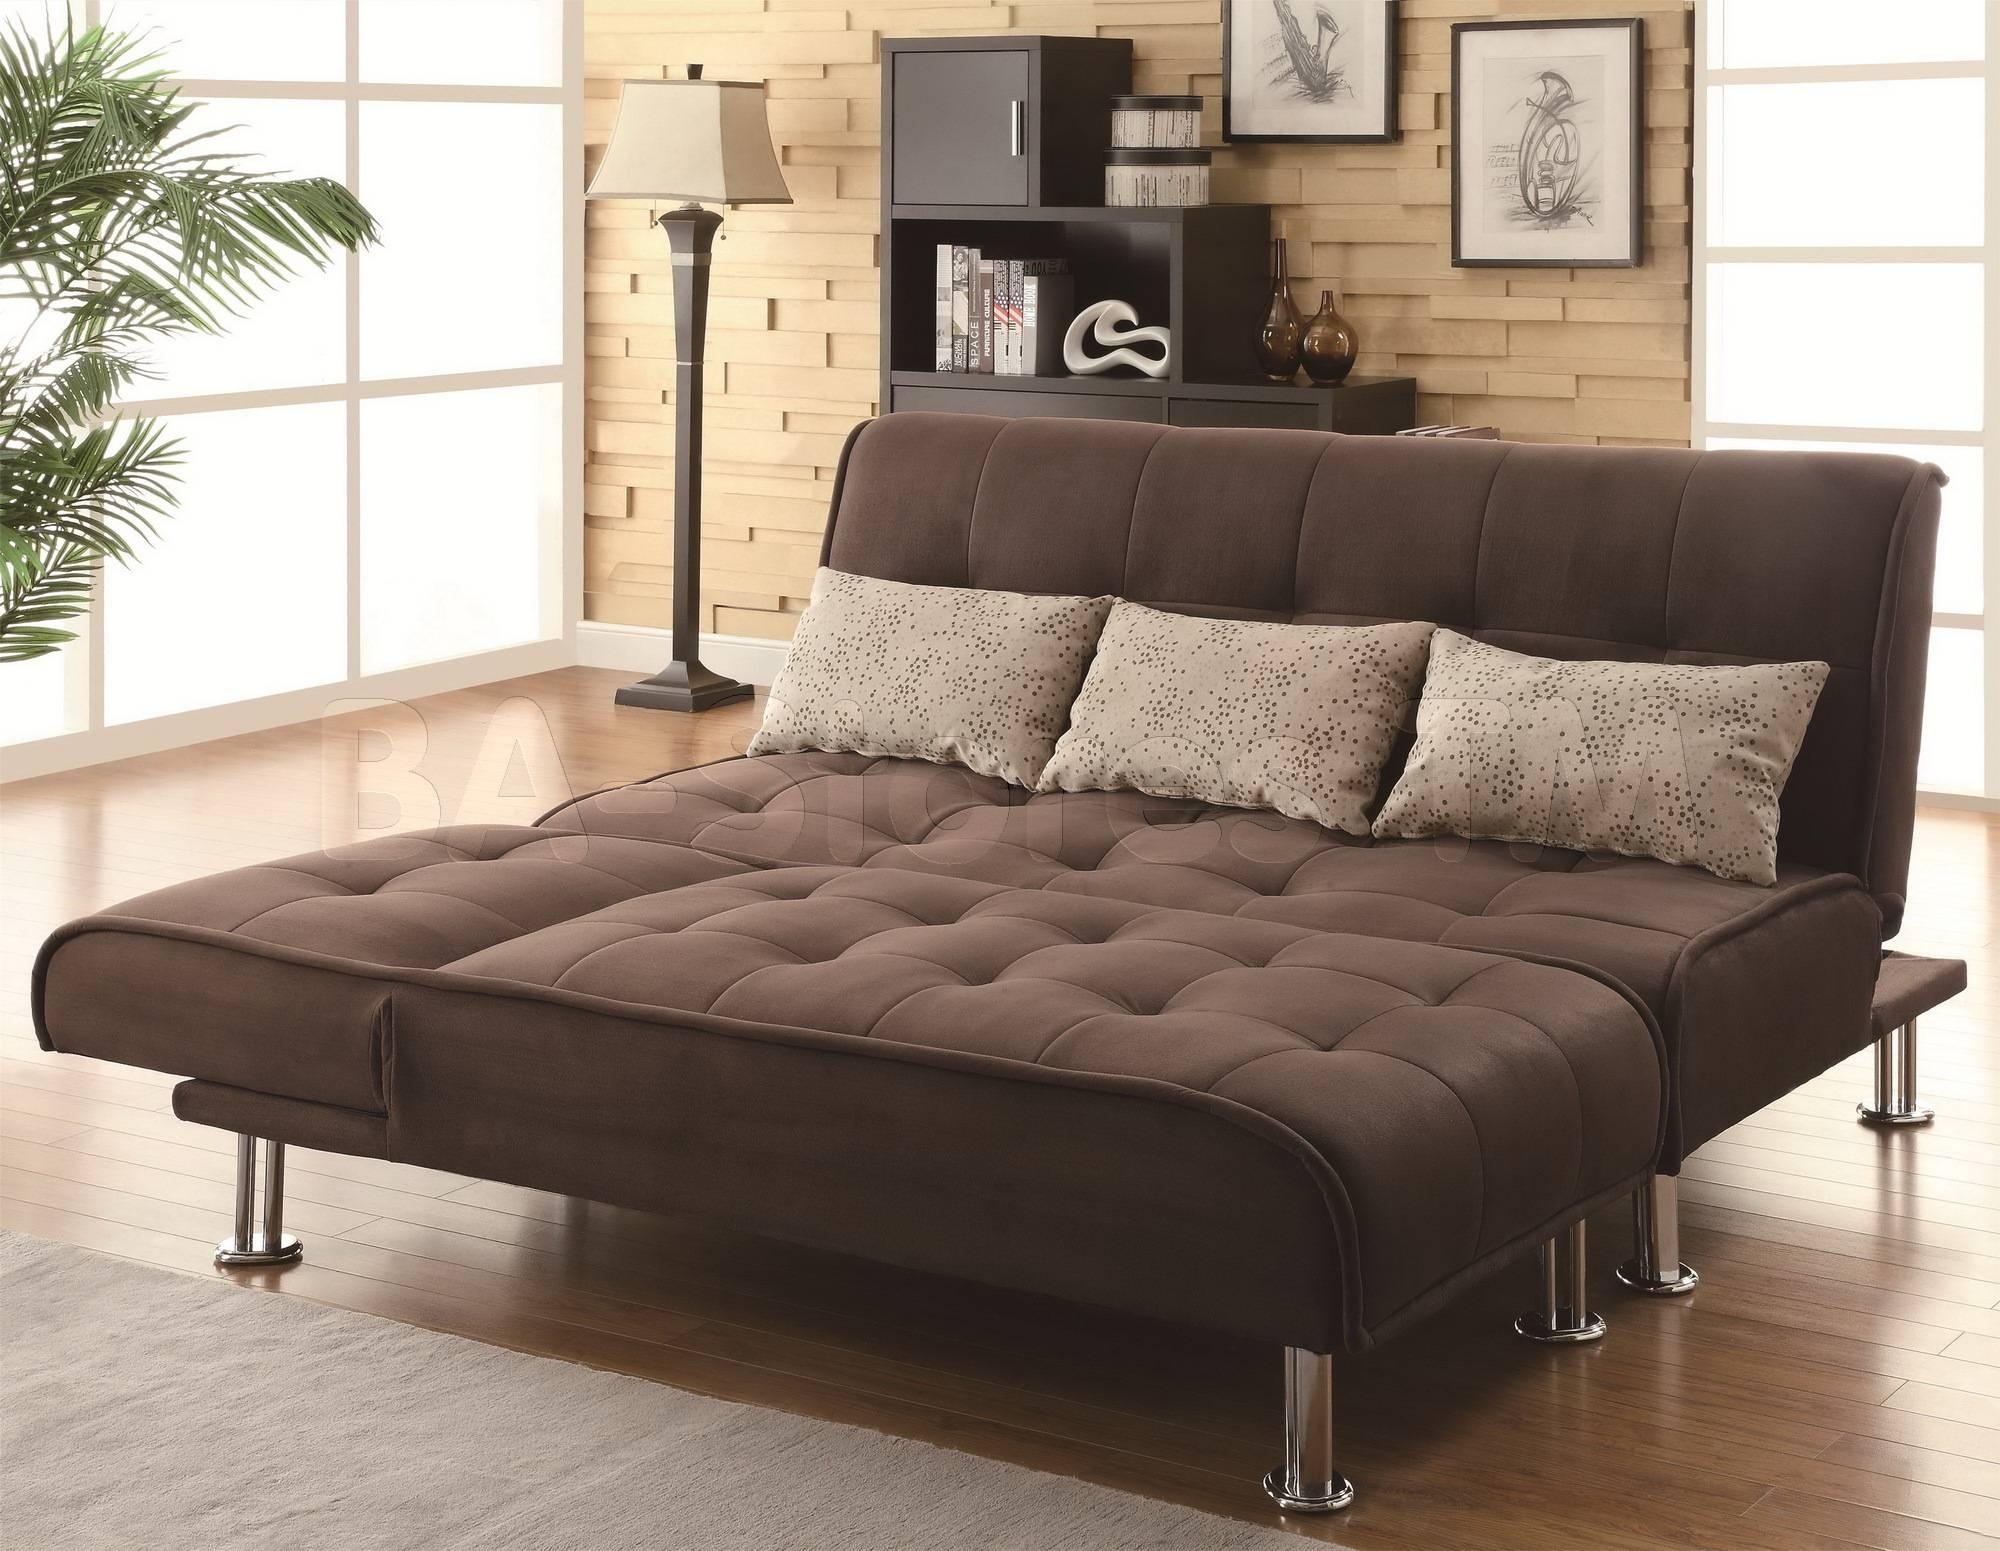 Furniture: King Size Sofa Sleepers | Tempurpedic Sofa Bed | Foam Intended For King Size Sofa Beds (View 11 of 15)